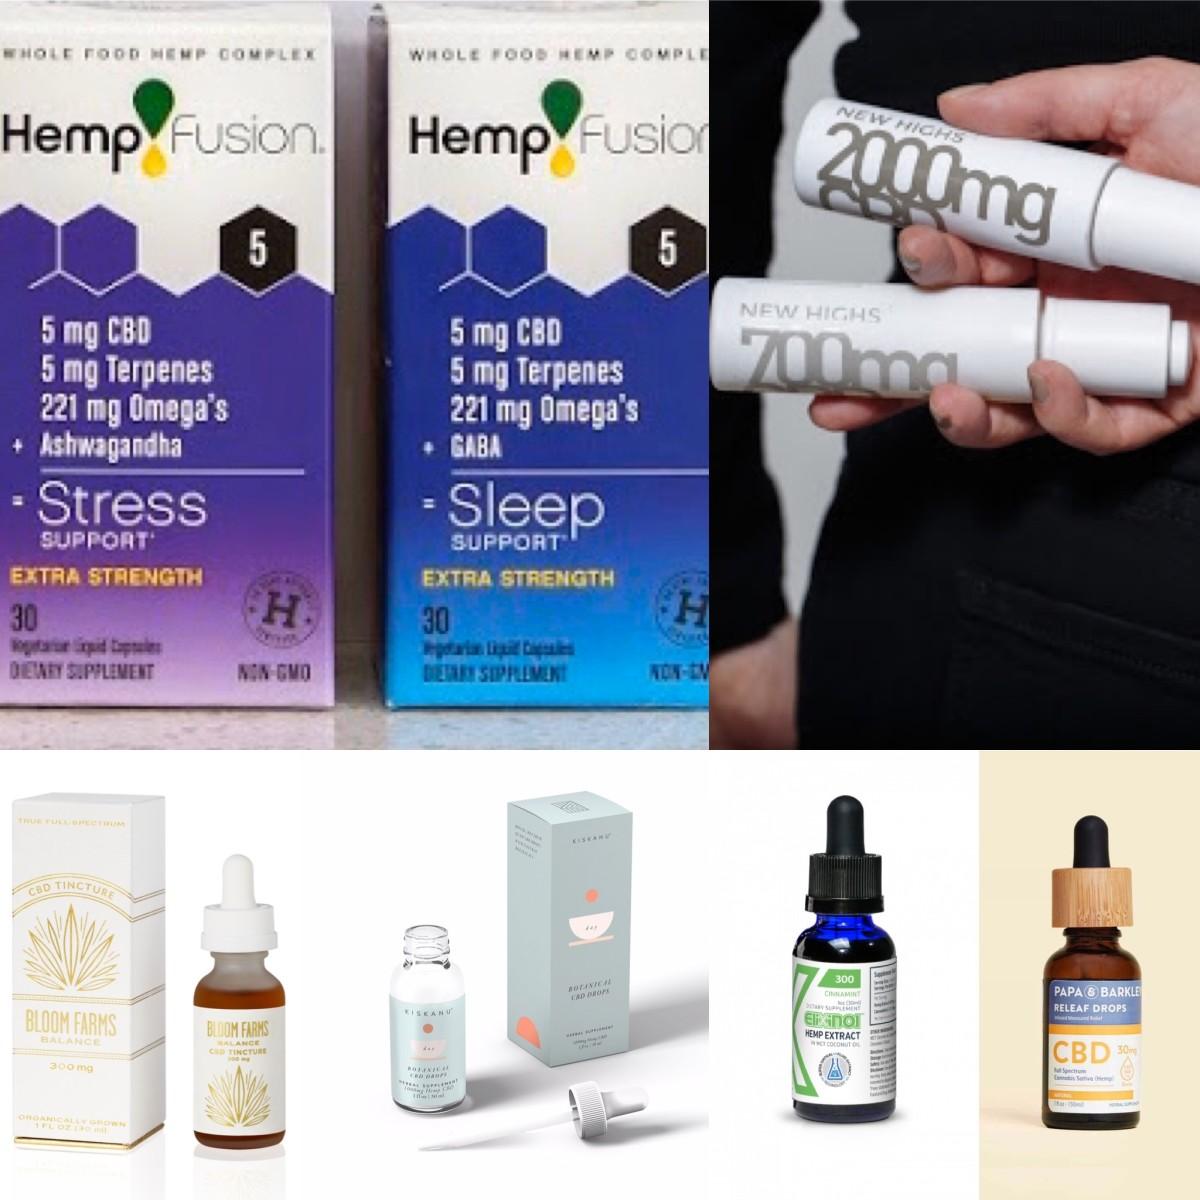 Bloom Farm, Exlinol, HempFusion, Kiskanu, New Highs, Pappa & Barkley